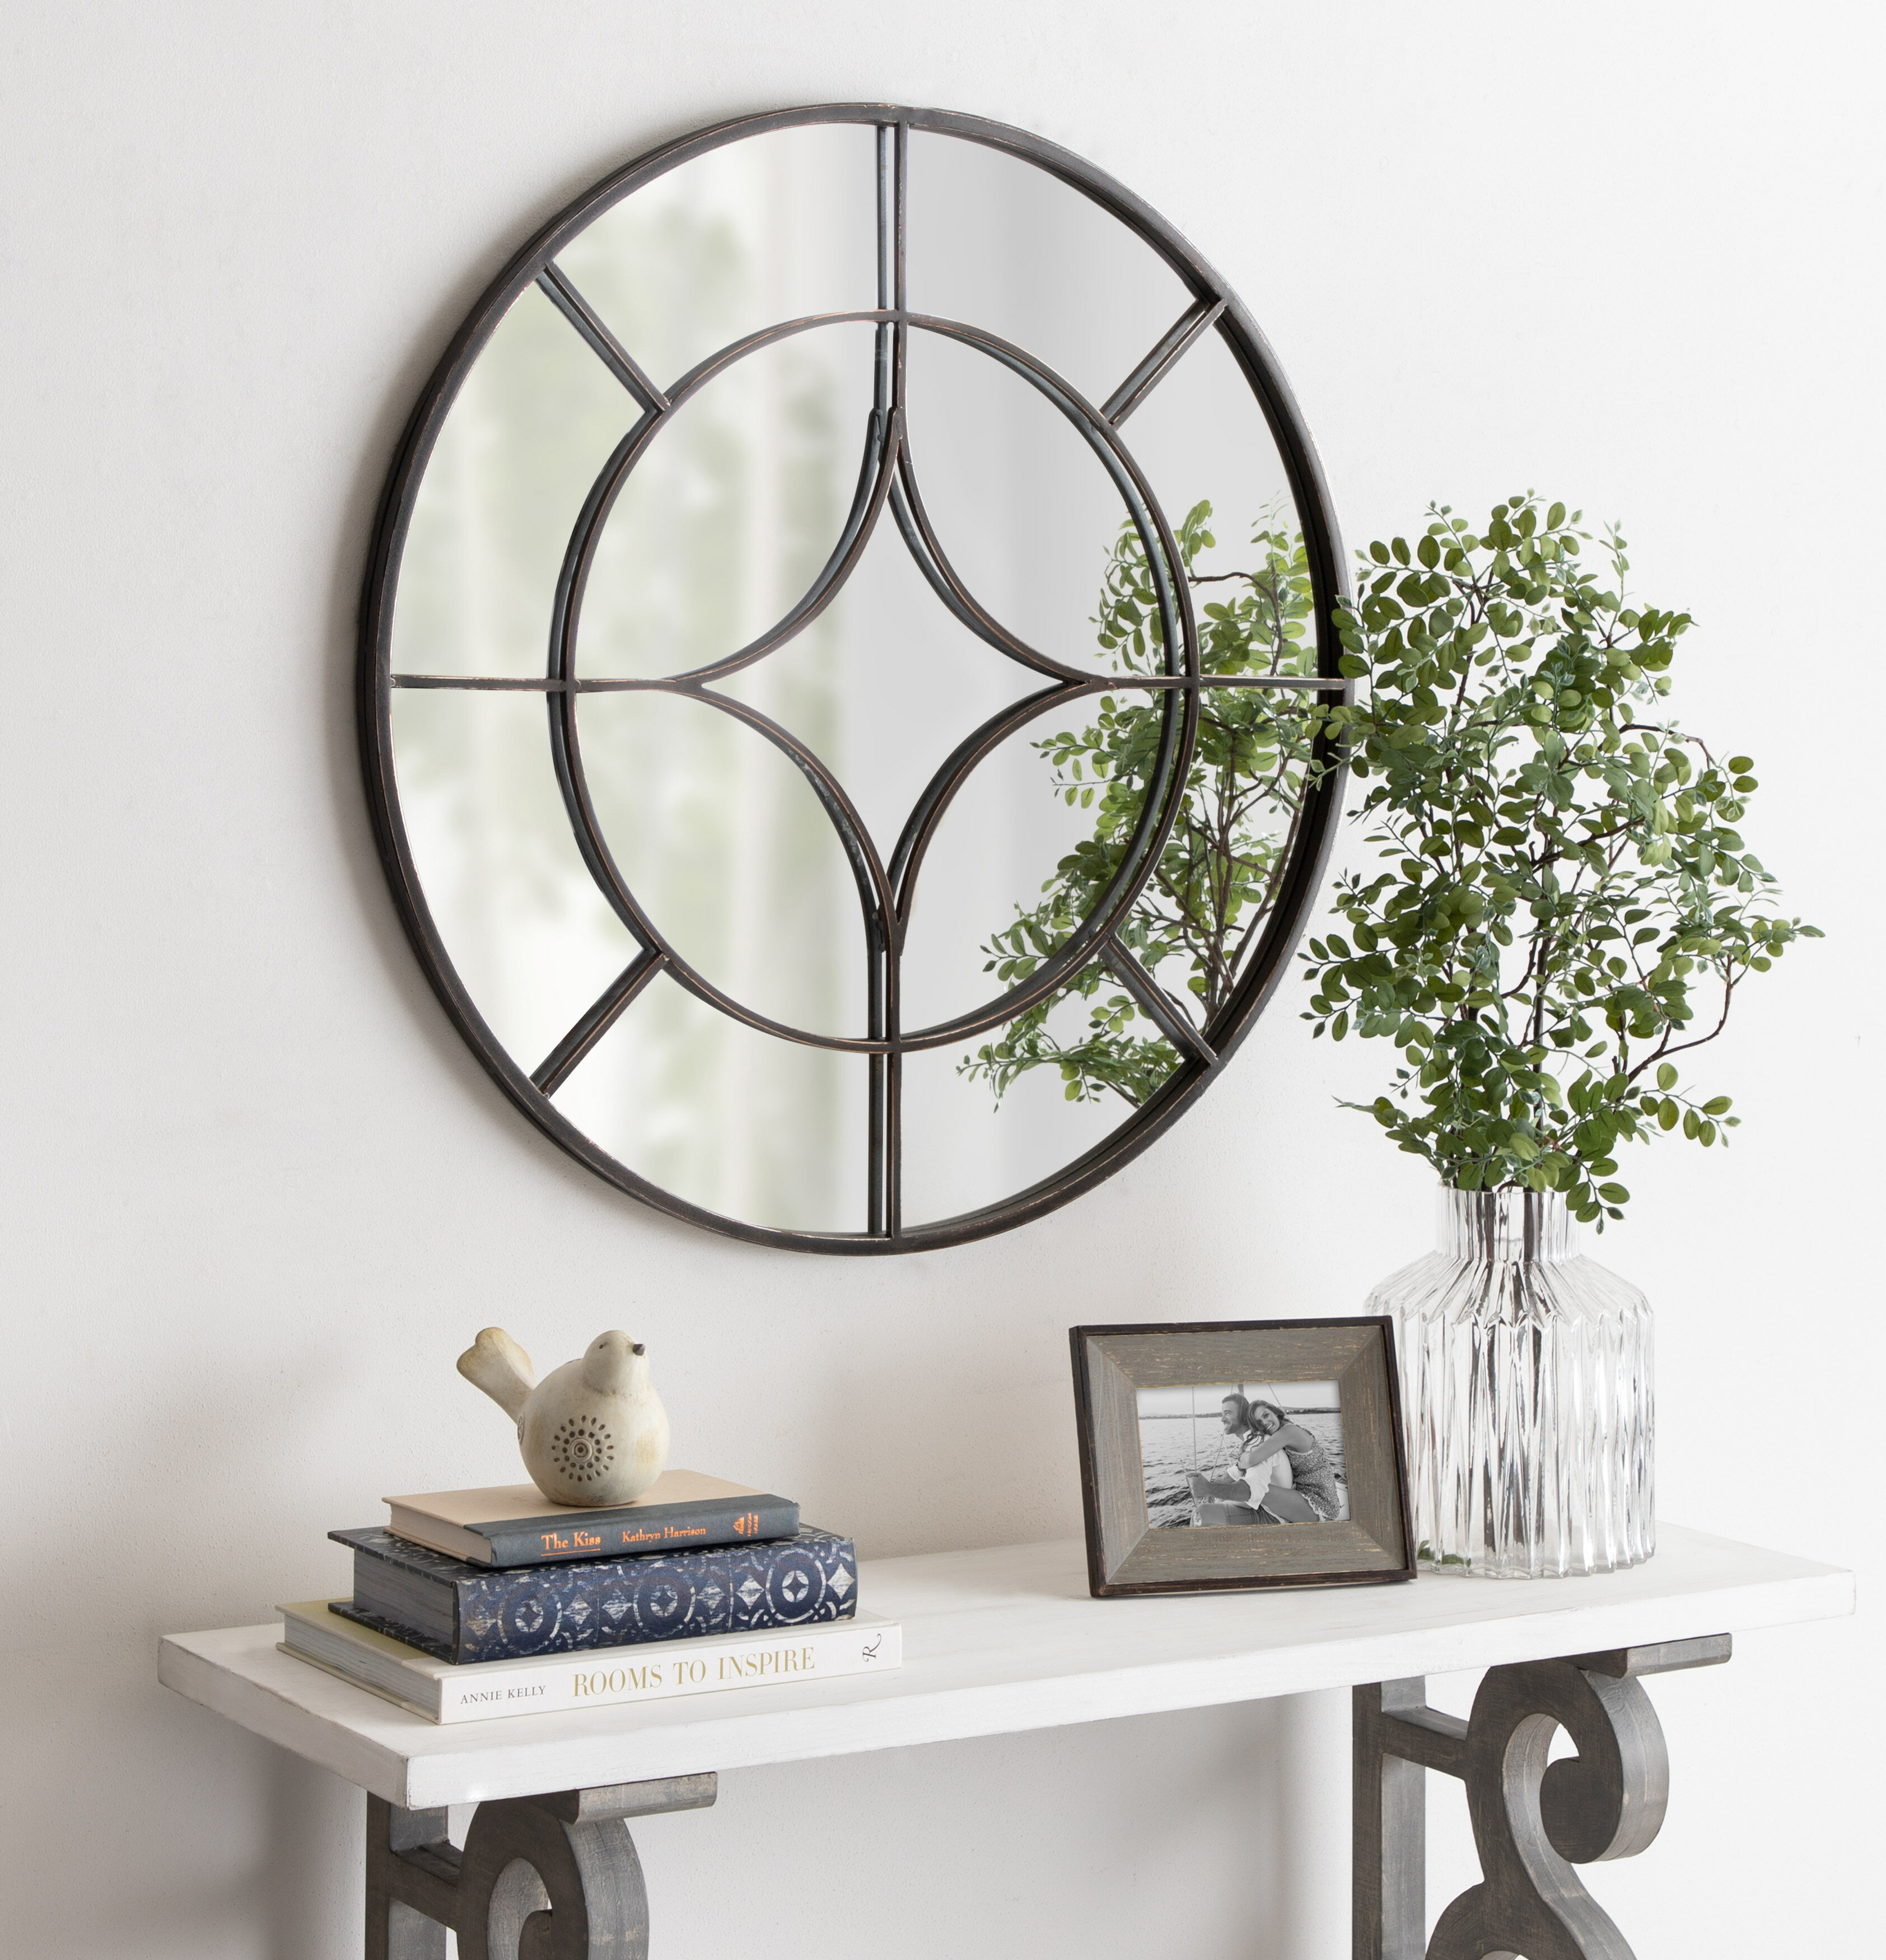 Hanska Industrial Modern Overlaid Beveled Frameless Accent Mirror Pertaining To Peetz Modern Rustic Accent Mirrors (Image 15 of 30)